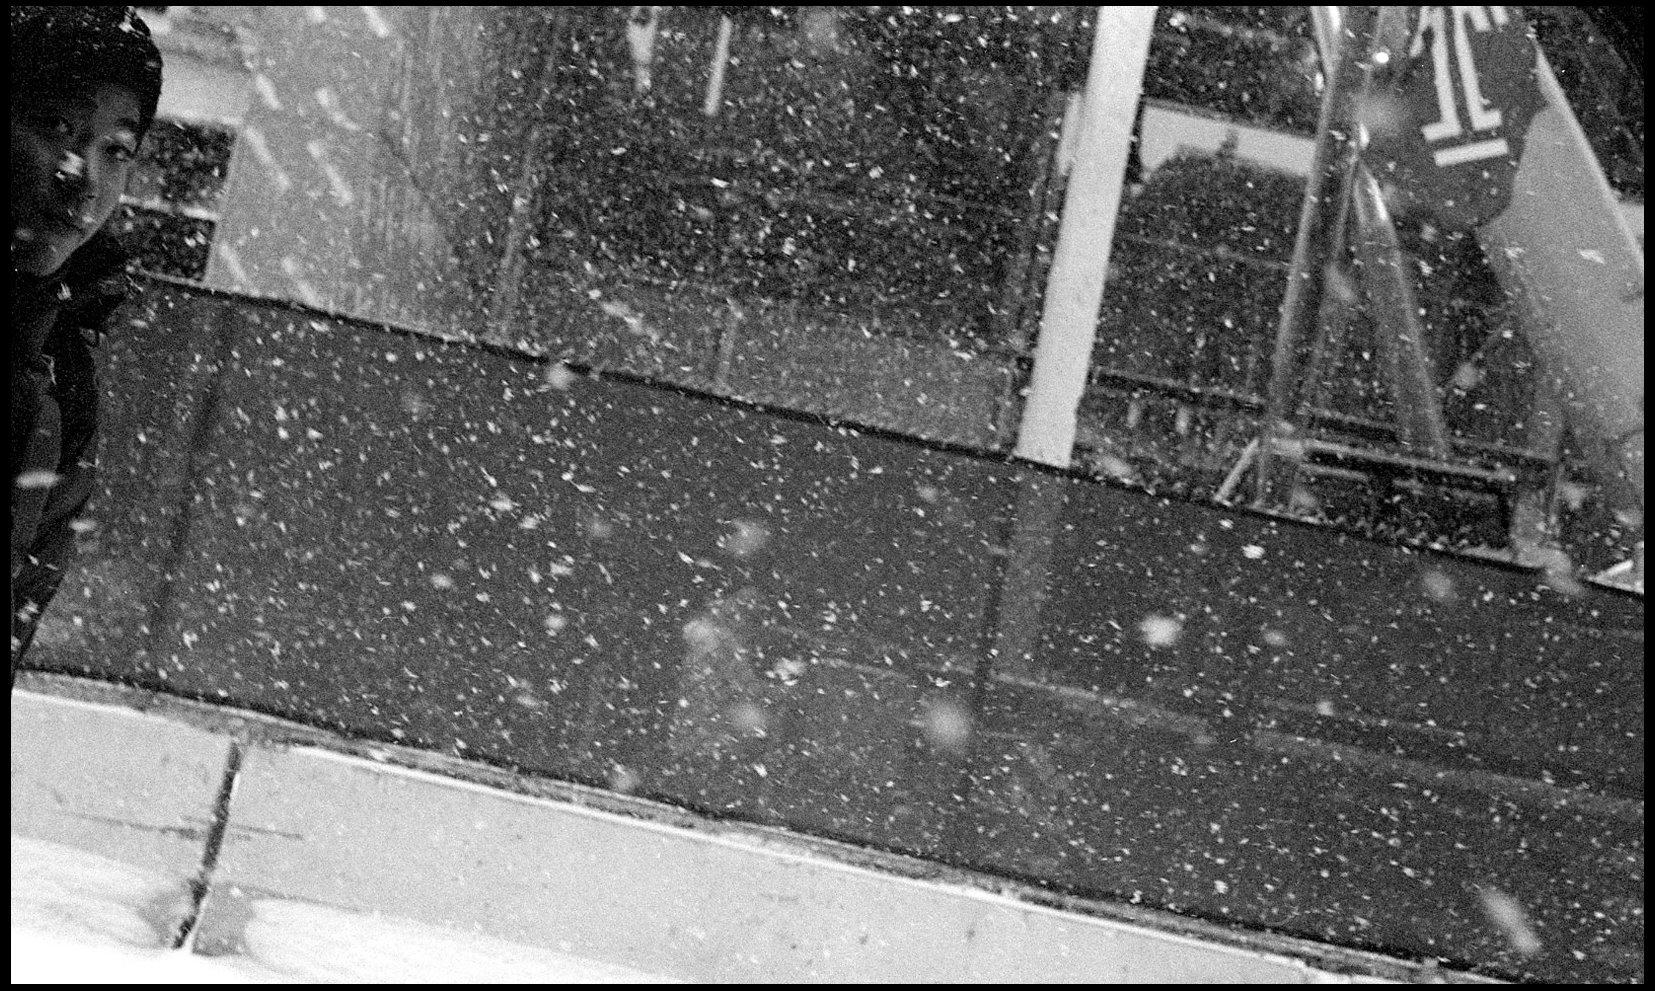 Snowstorm, North Philadelphia.